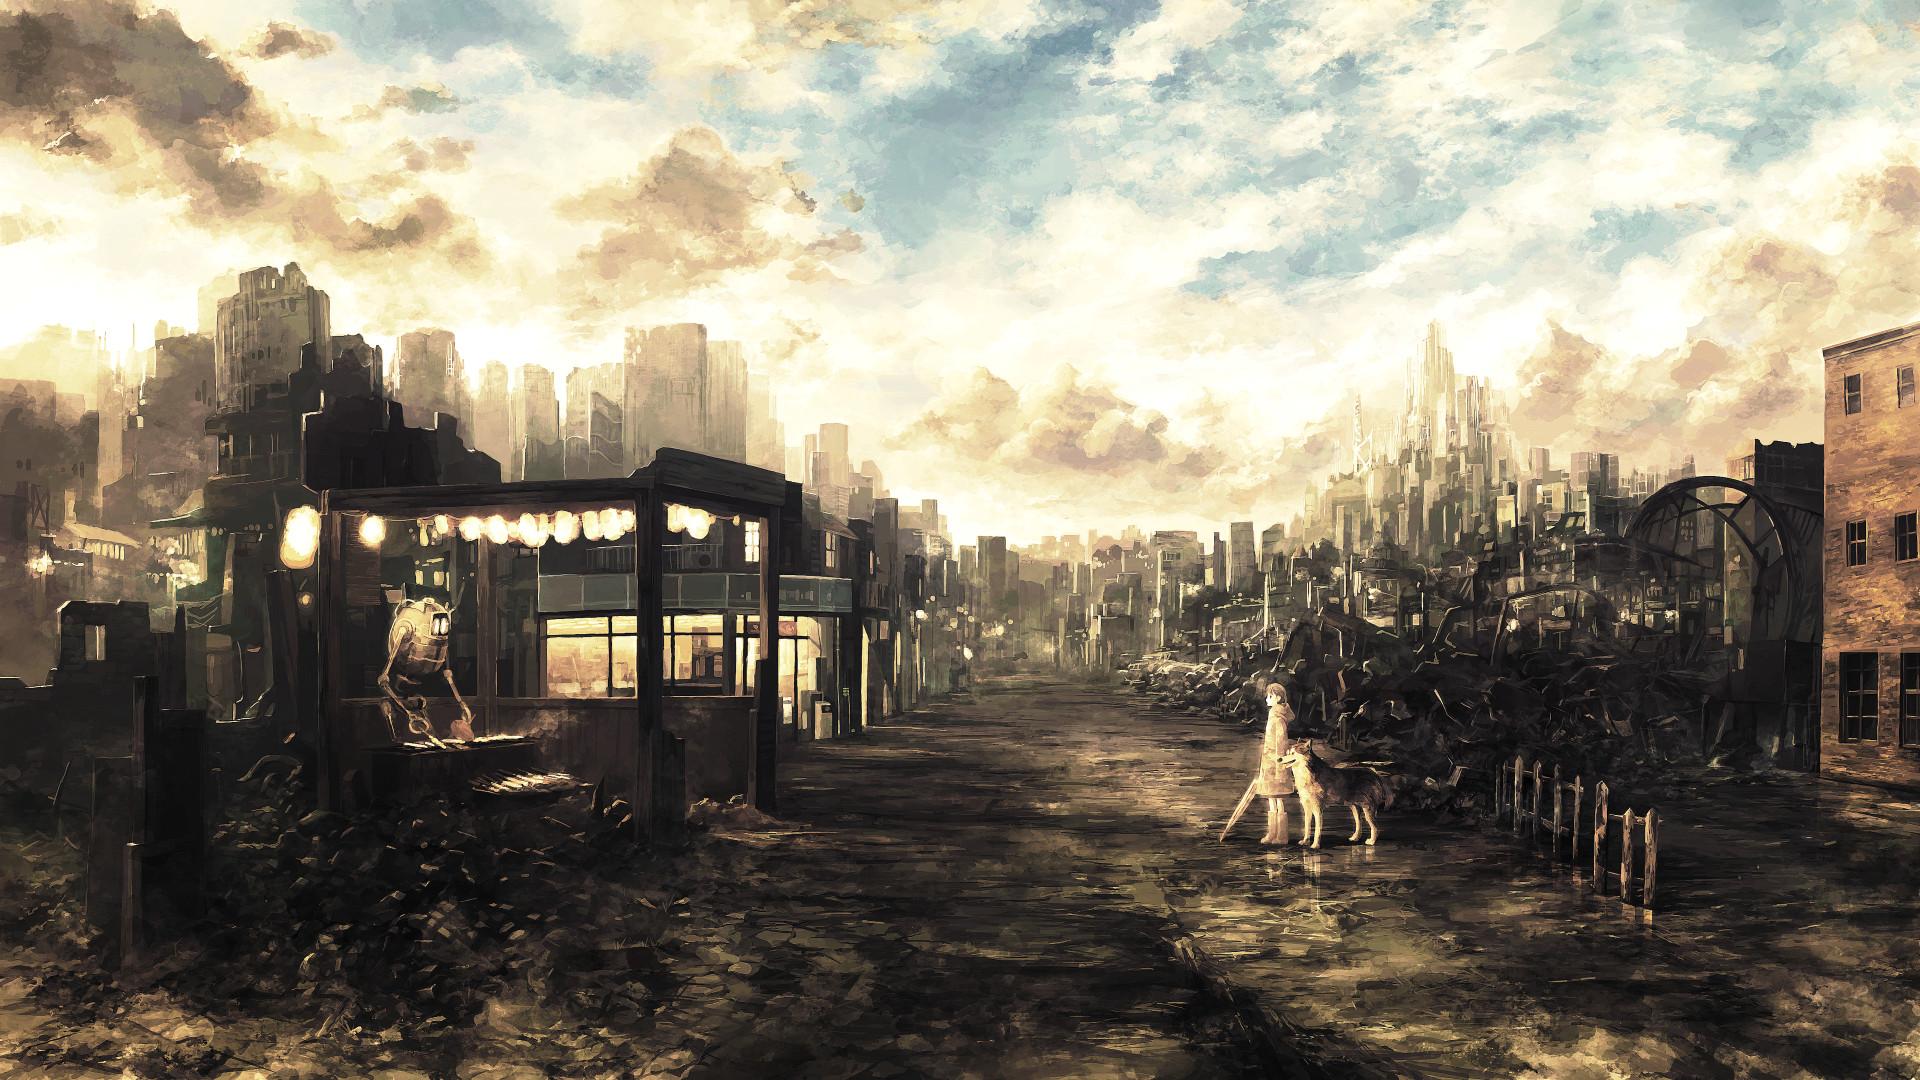 133936-city-fantasy_art-anime_girls-wasteland-ruin-apocalyptic-dog-mixtape_2-manga.png  (1920×1080)   Apokalipsa zombie sf   Pinterest